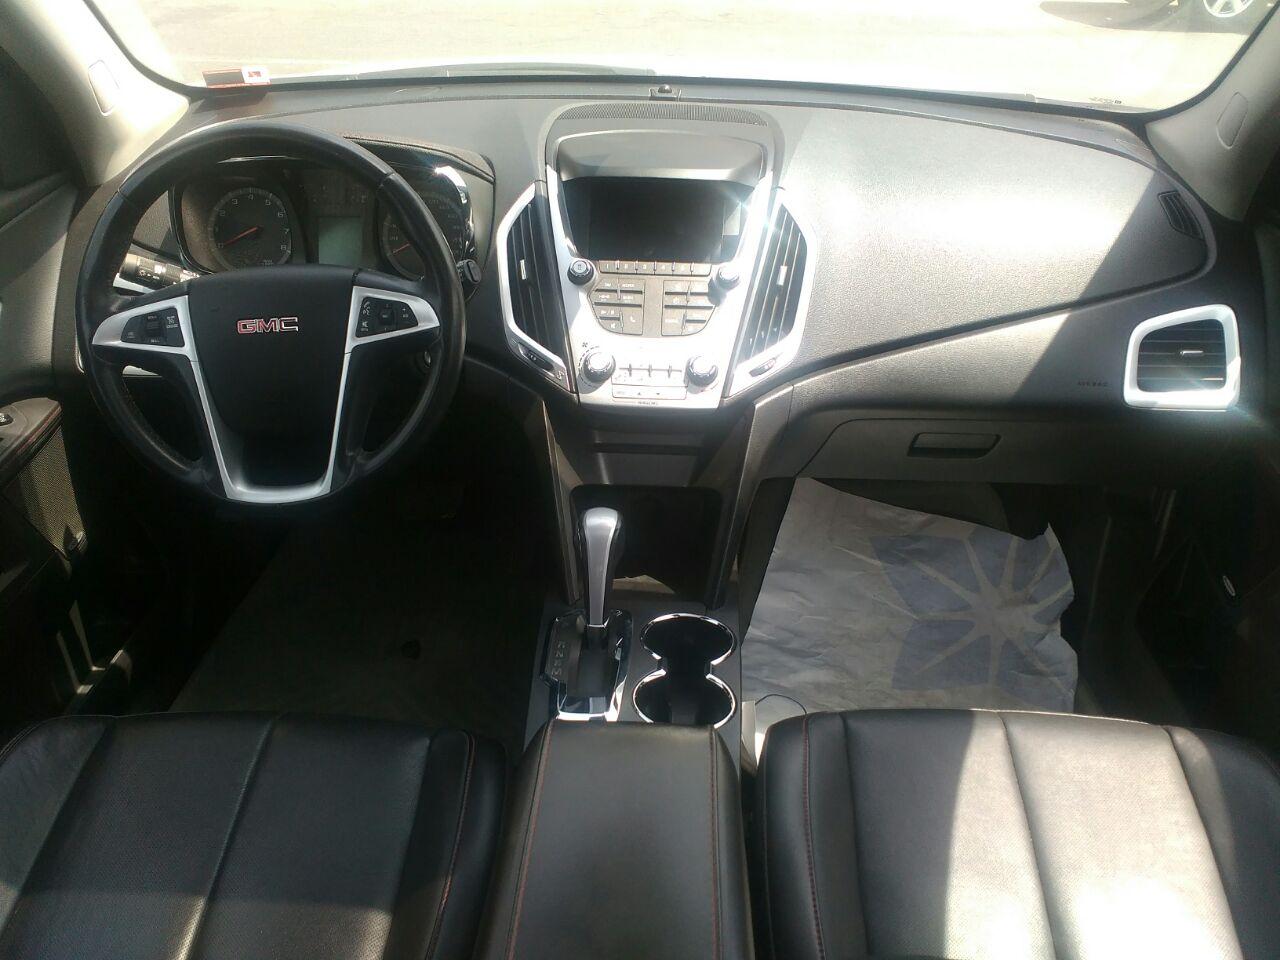 Used Gmc Terrain 2012 Car For Sale In Doha 697950